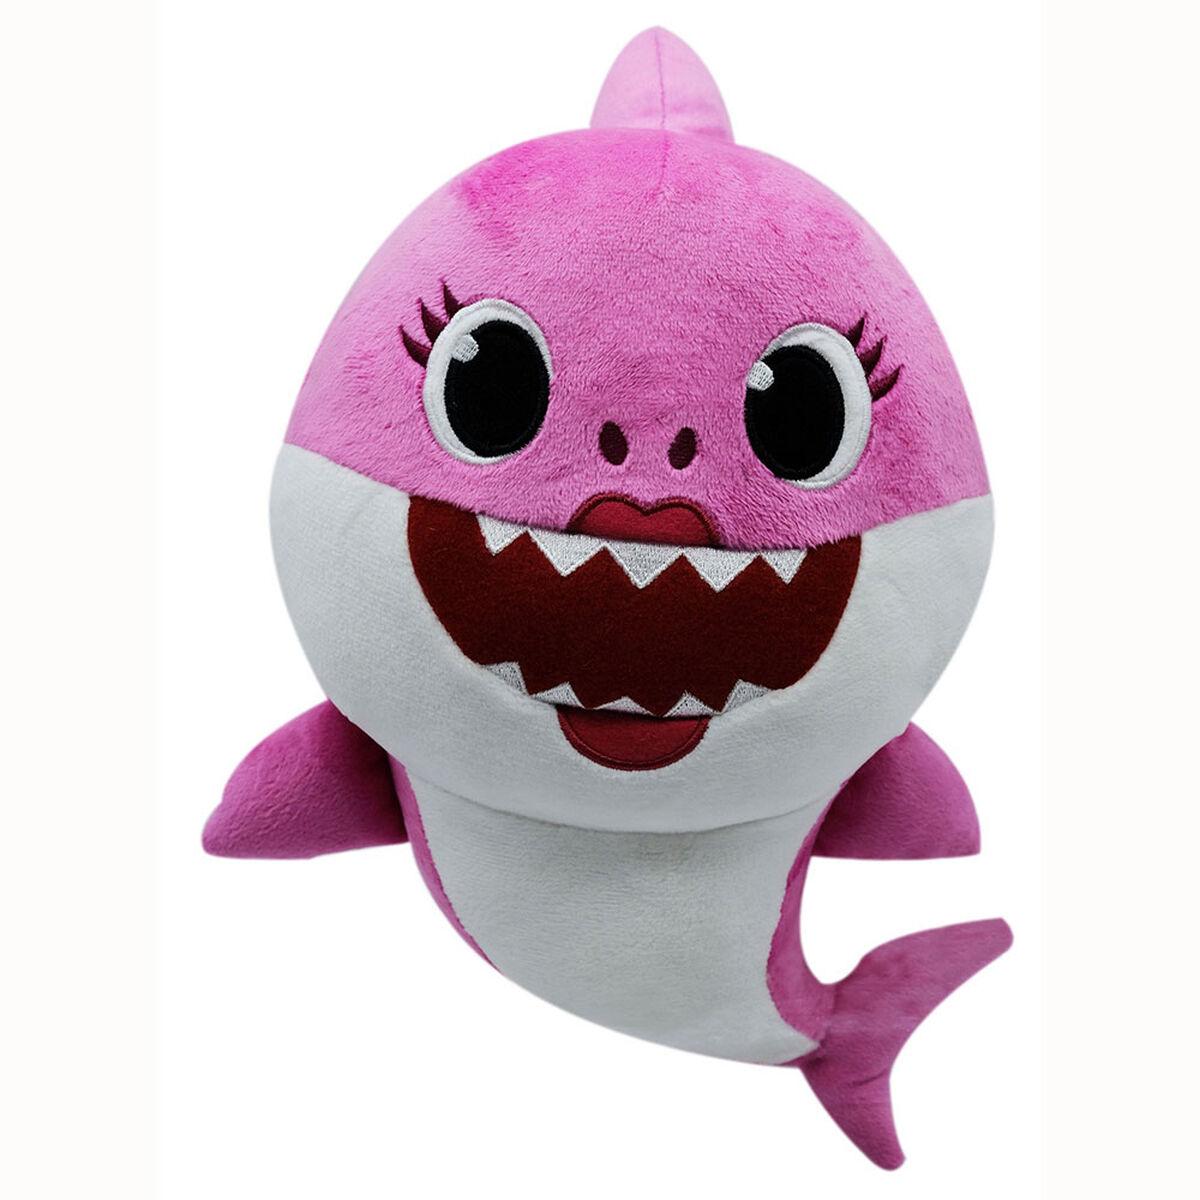 Peluche Mama Shark 11.5 con sonido BABY SHARK